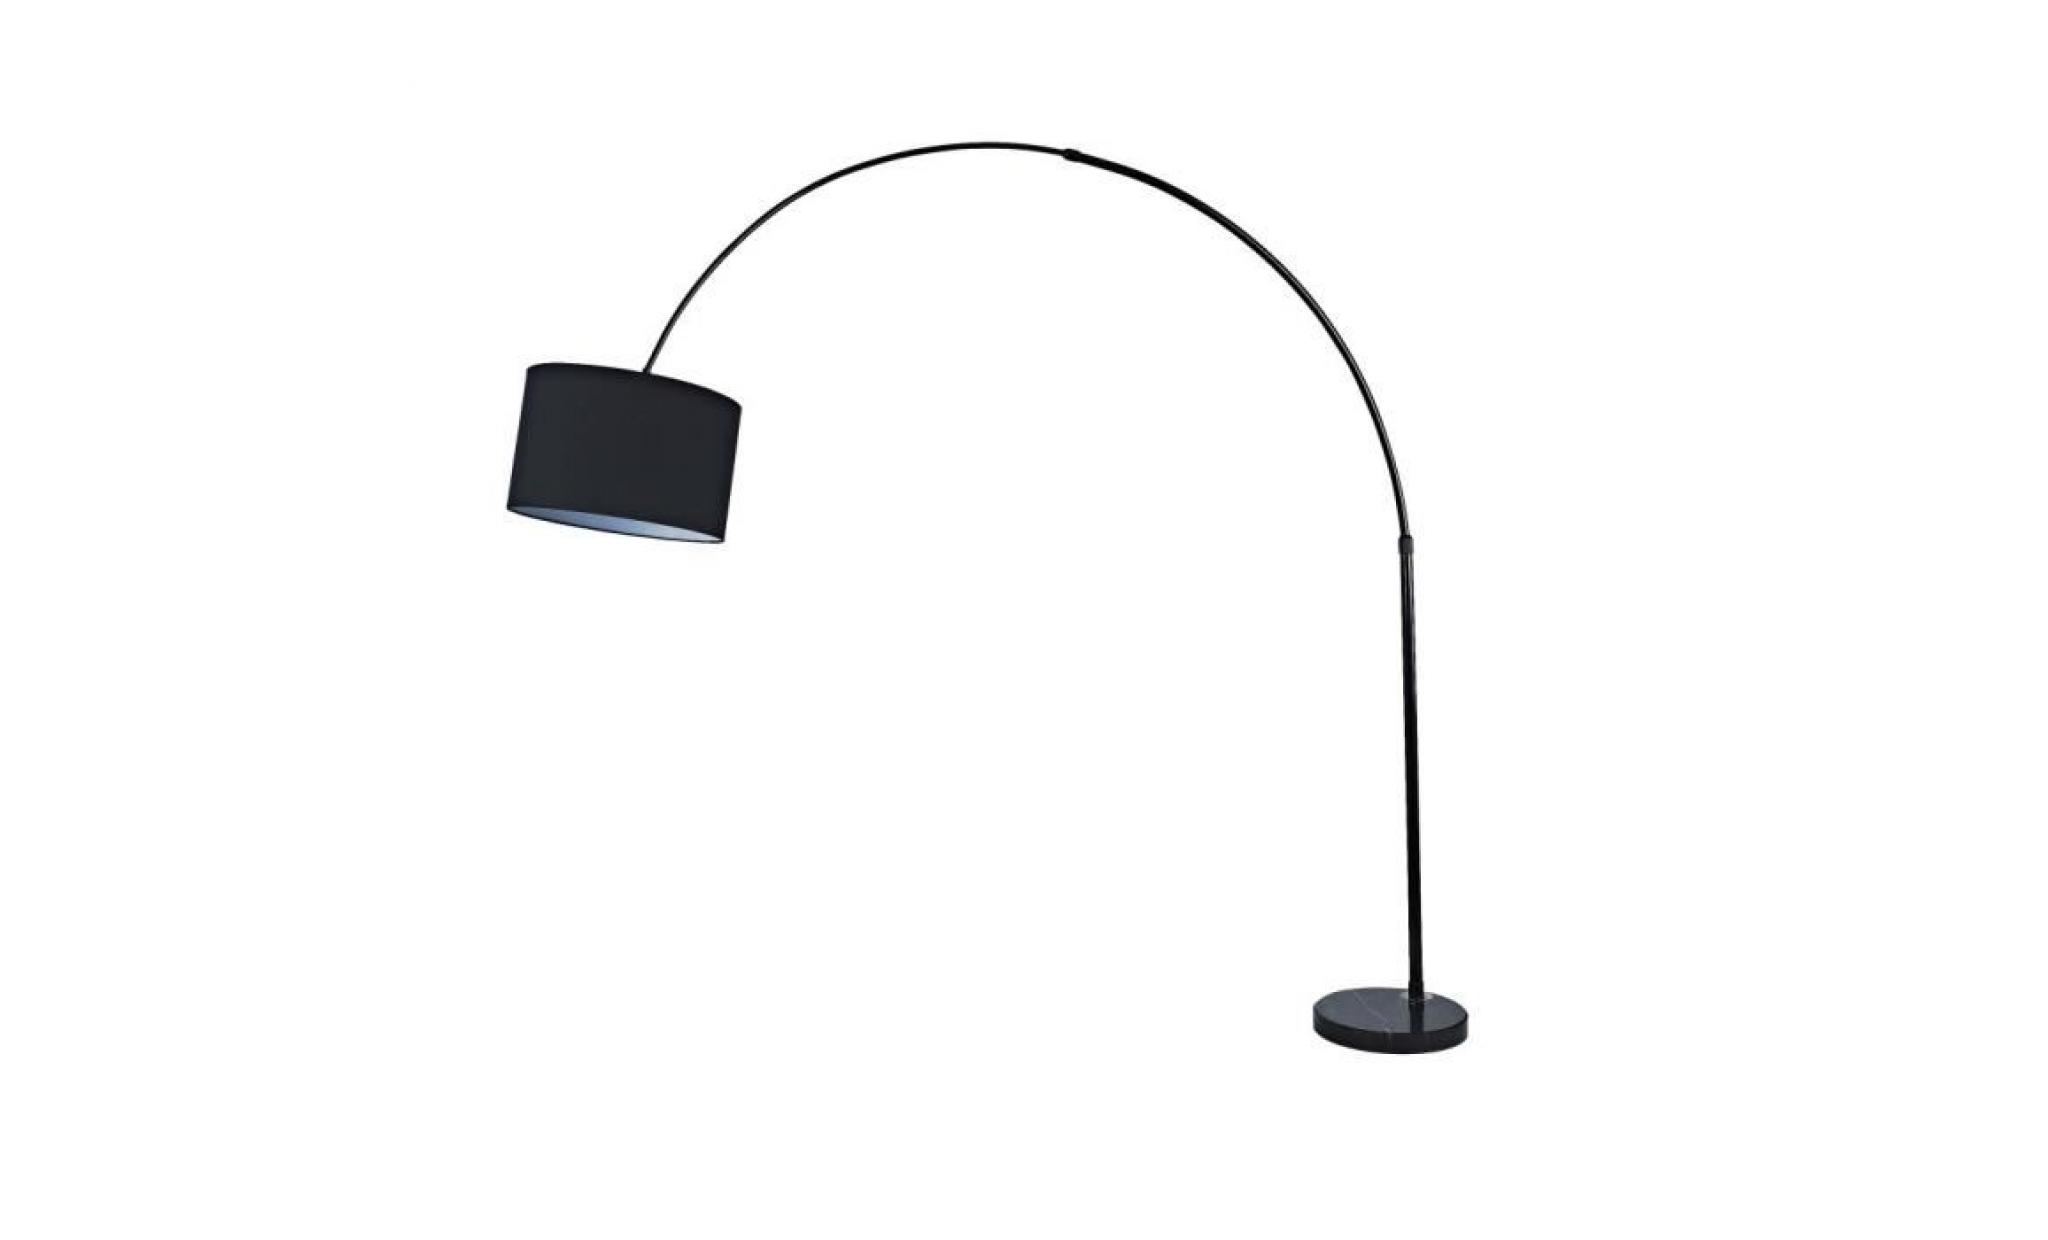 arno lampadaires arc 195 cm noir achat vente lampadaire. Black Bedroom Furniture Sets. Home Design Ideas